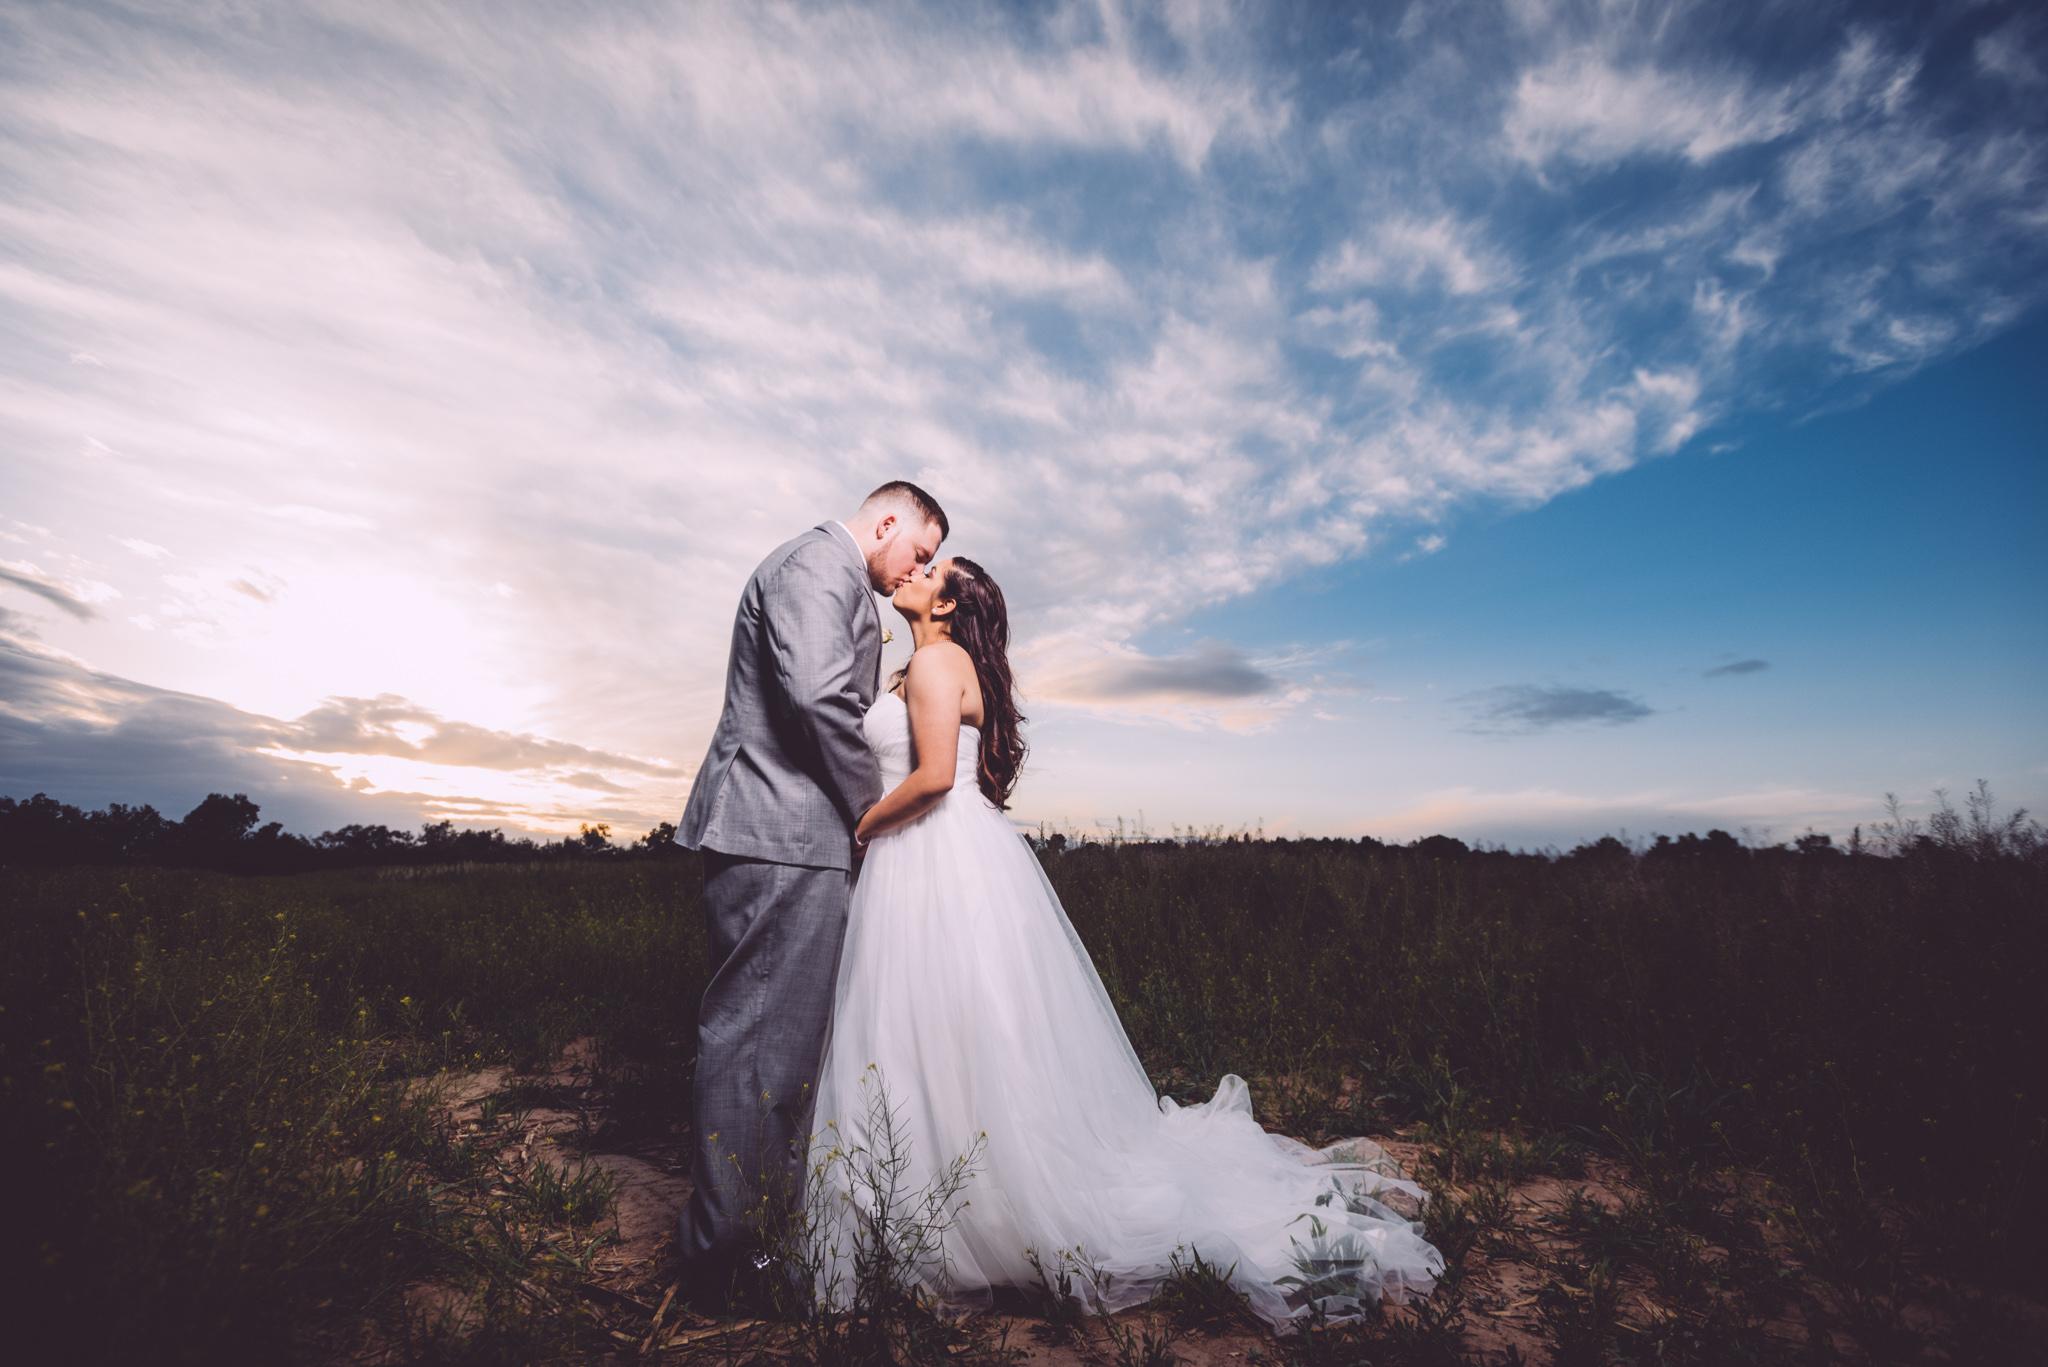 wedding-photos-schnepf-farms-az-andrew-ybanez-elementalfotos.jpg